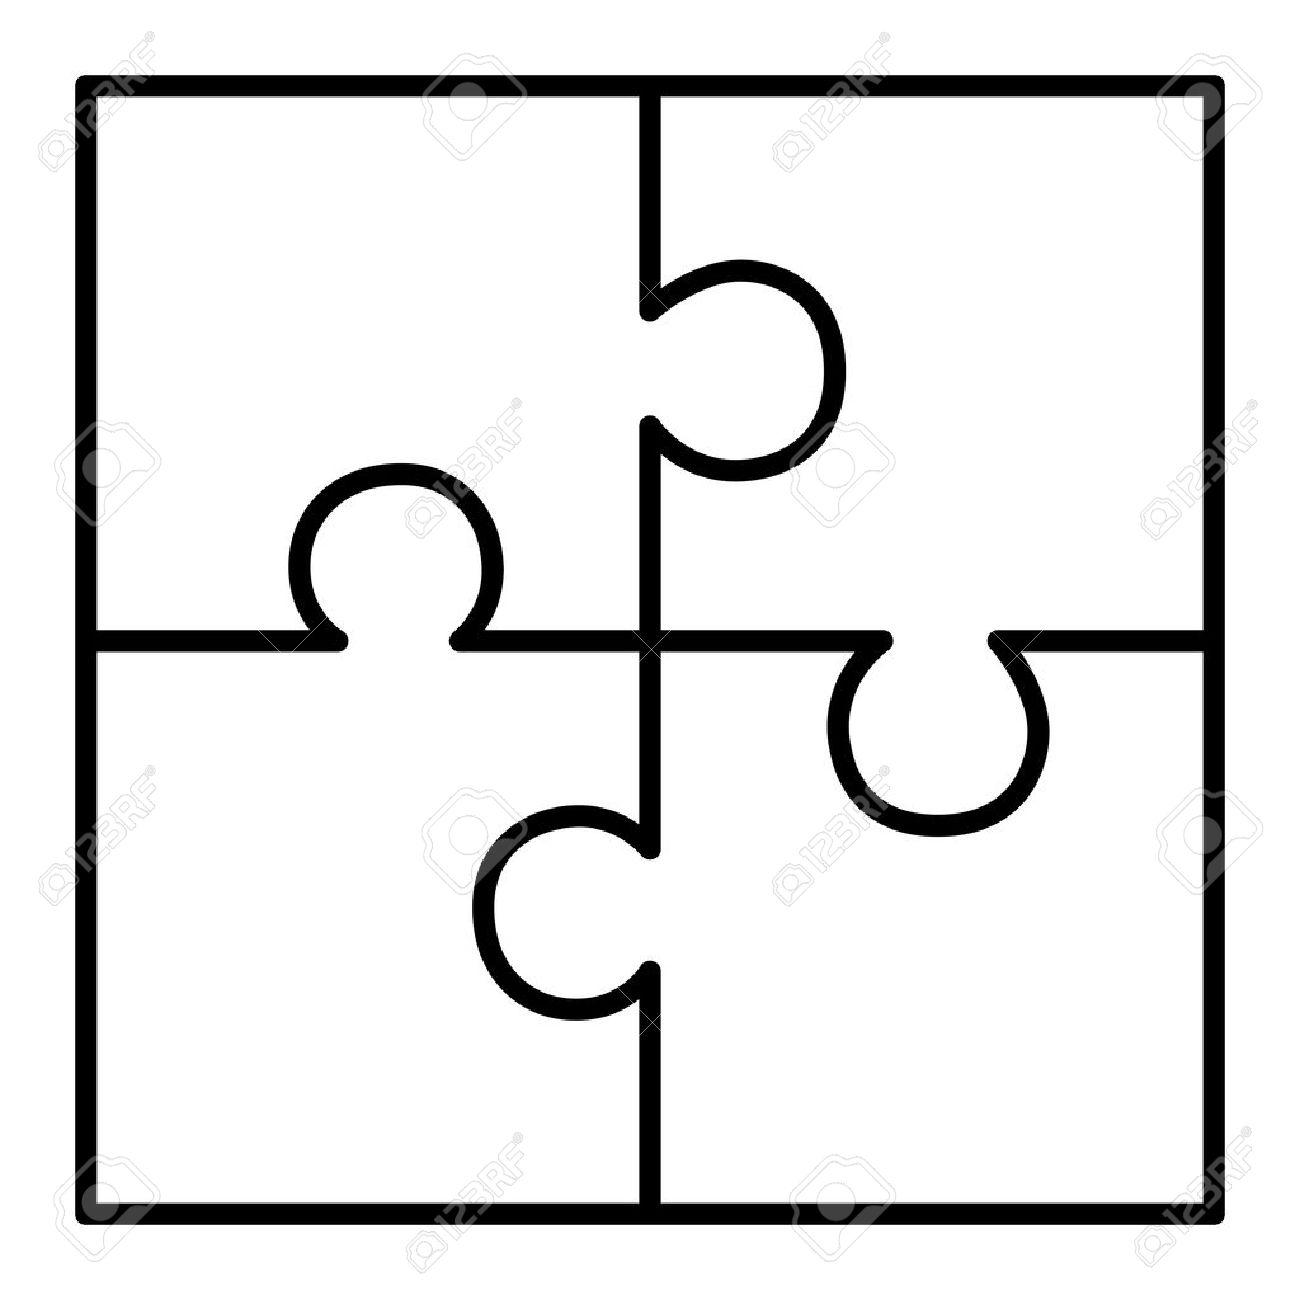 Puzzle Pieces Vector Clipart